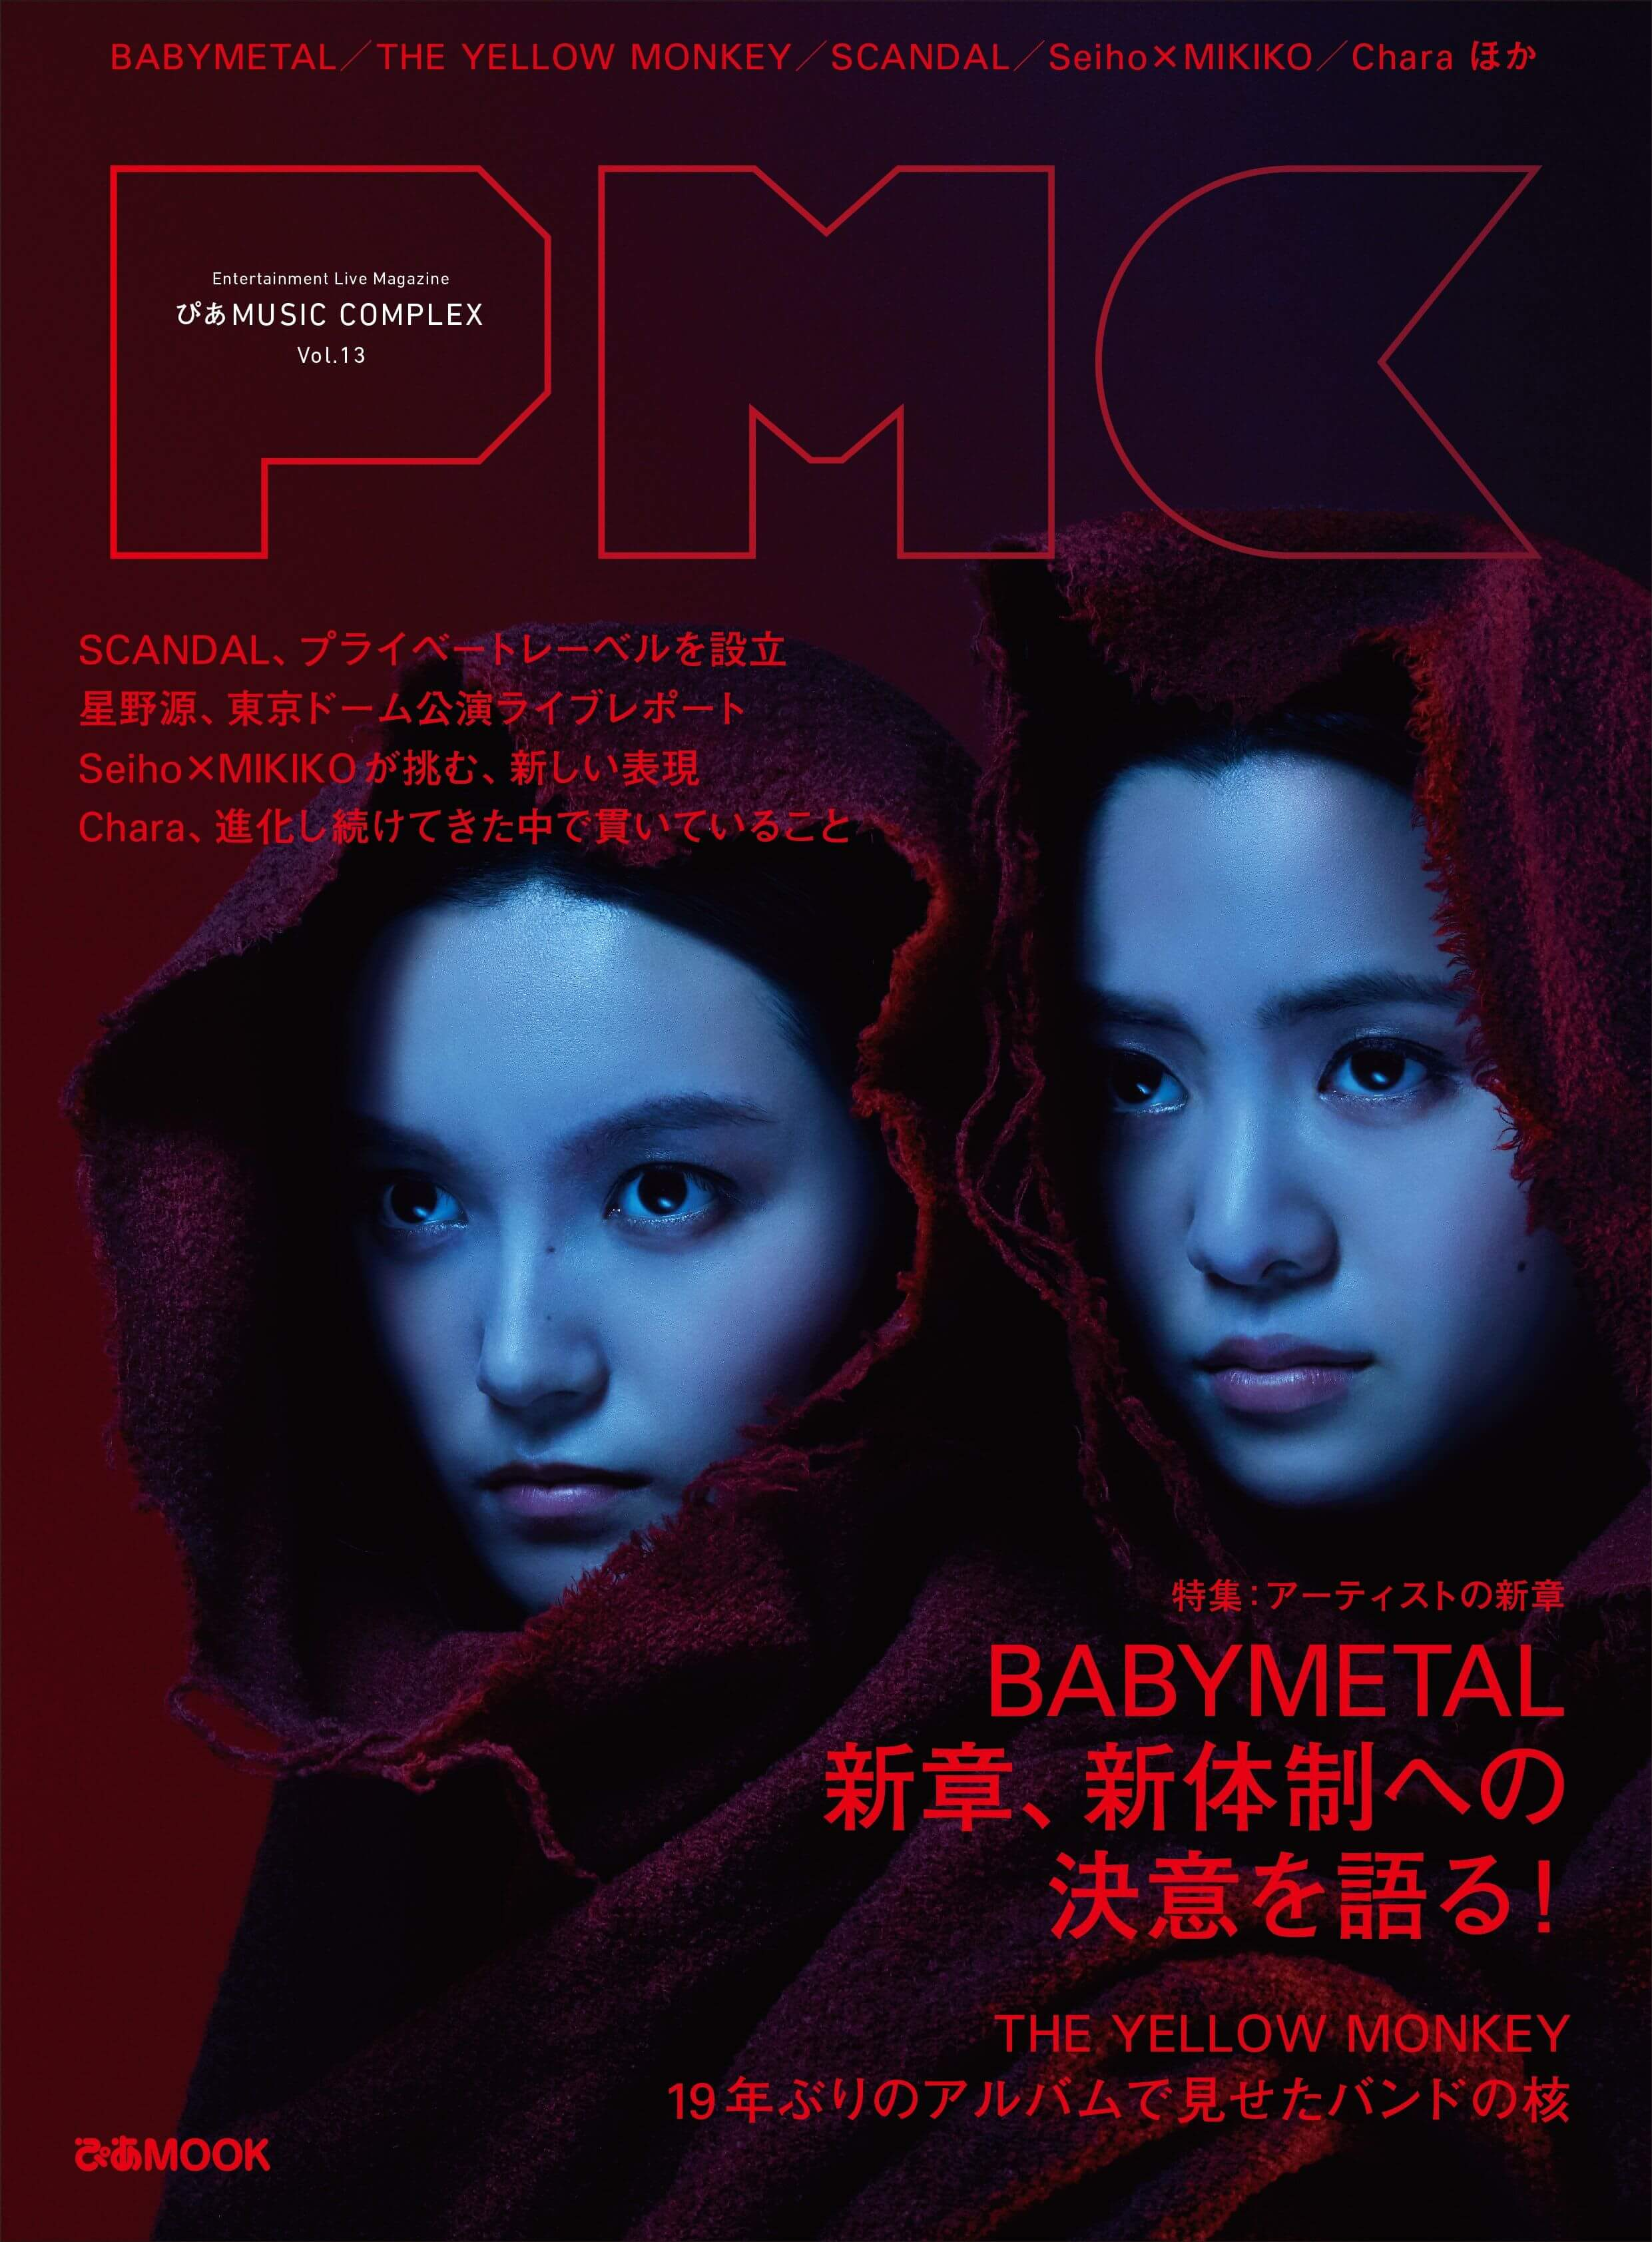 babymetal-2-2-2